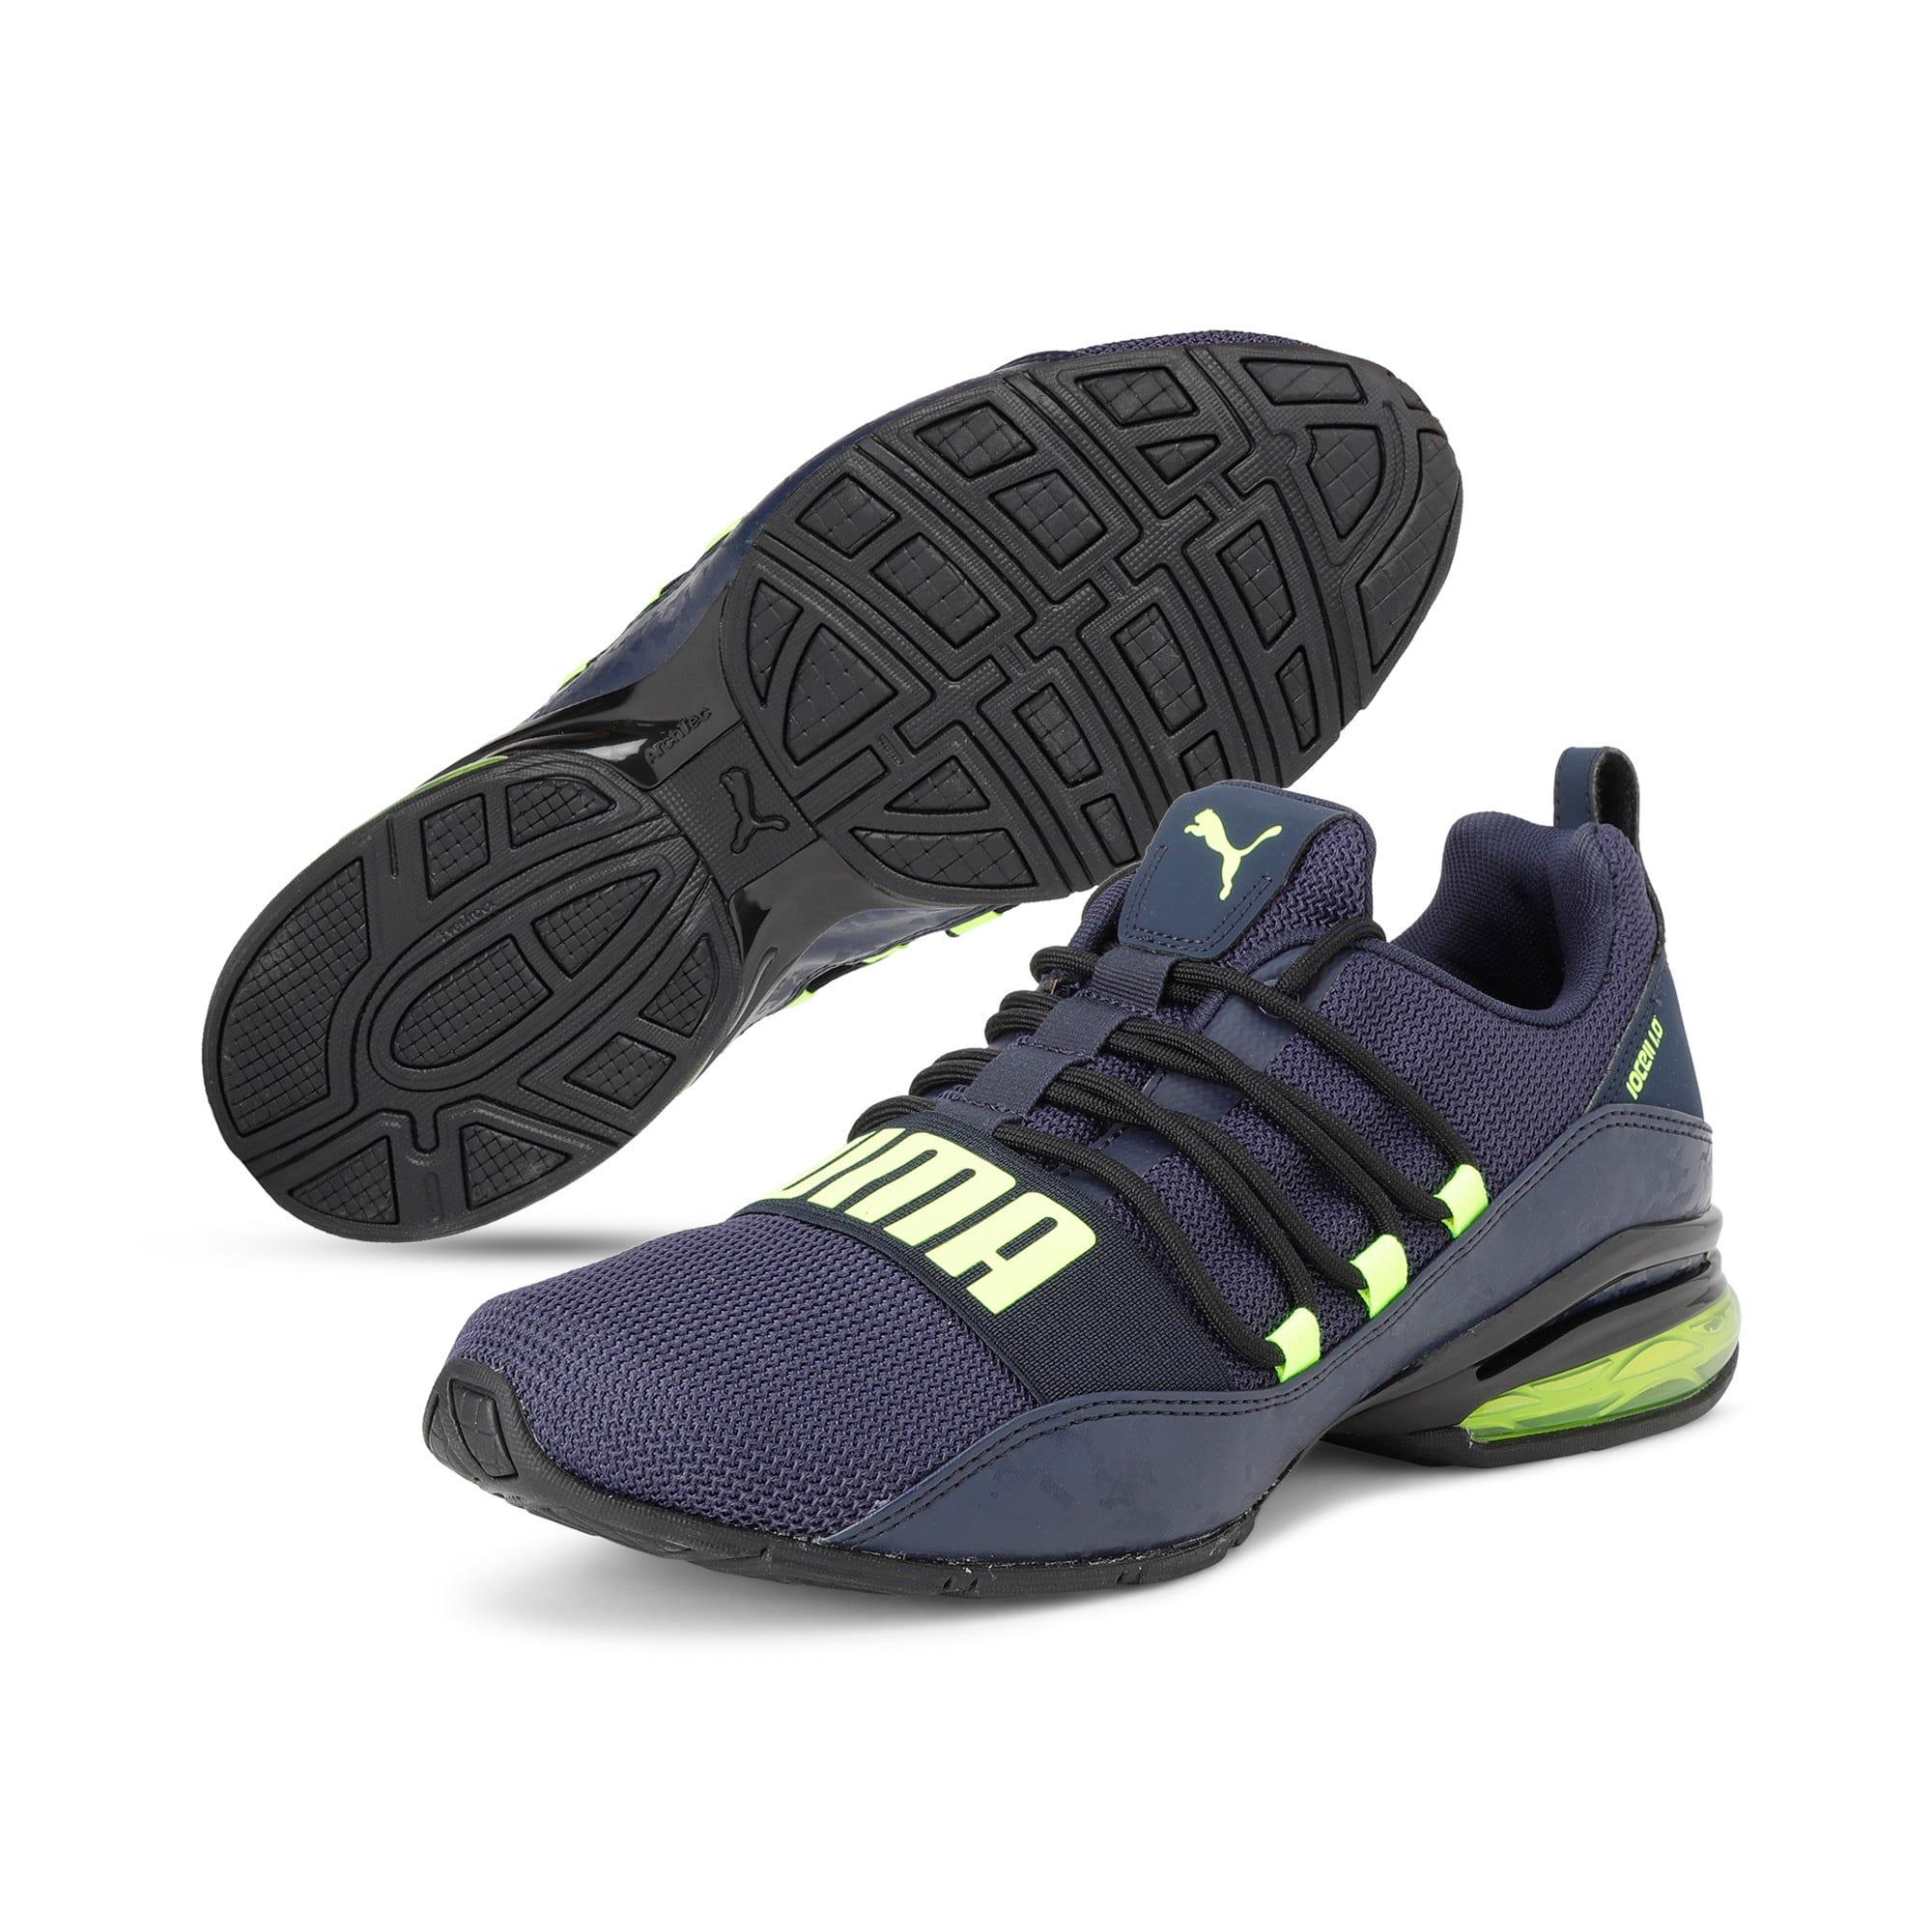 Thumbnail 4 of Cell Regulate Camo Men's Running Shoes, Peacoat-Yellow Alert, medium-IND